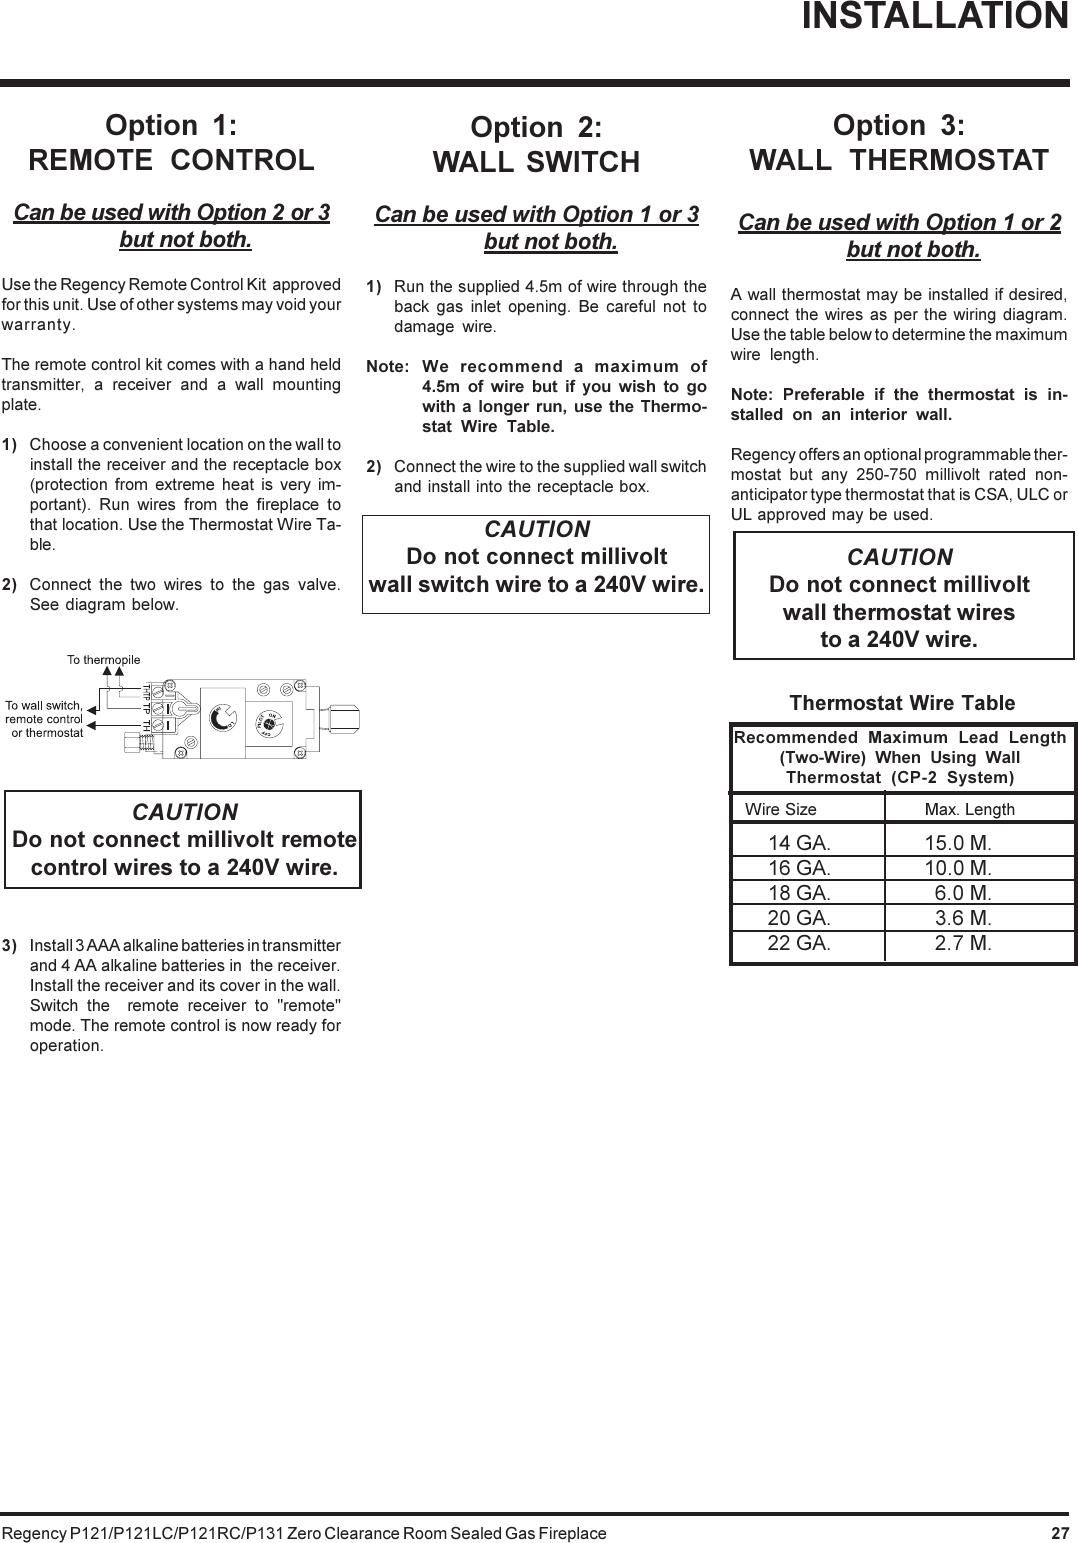 Regency See Thru P121 Ng Users Manual 918 179a (01 26 06).PMD on